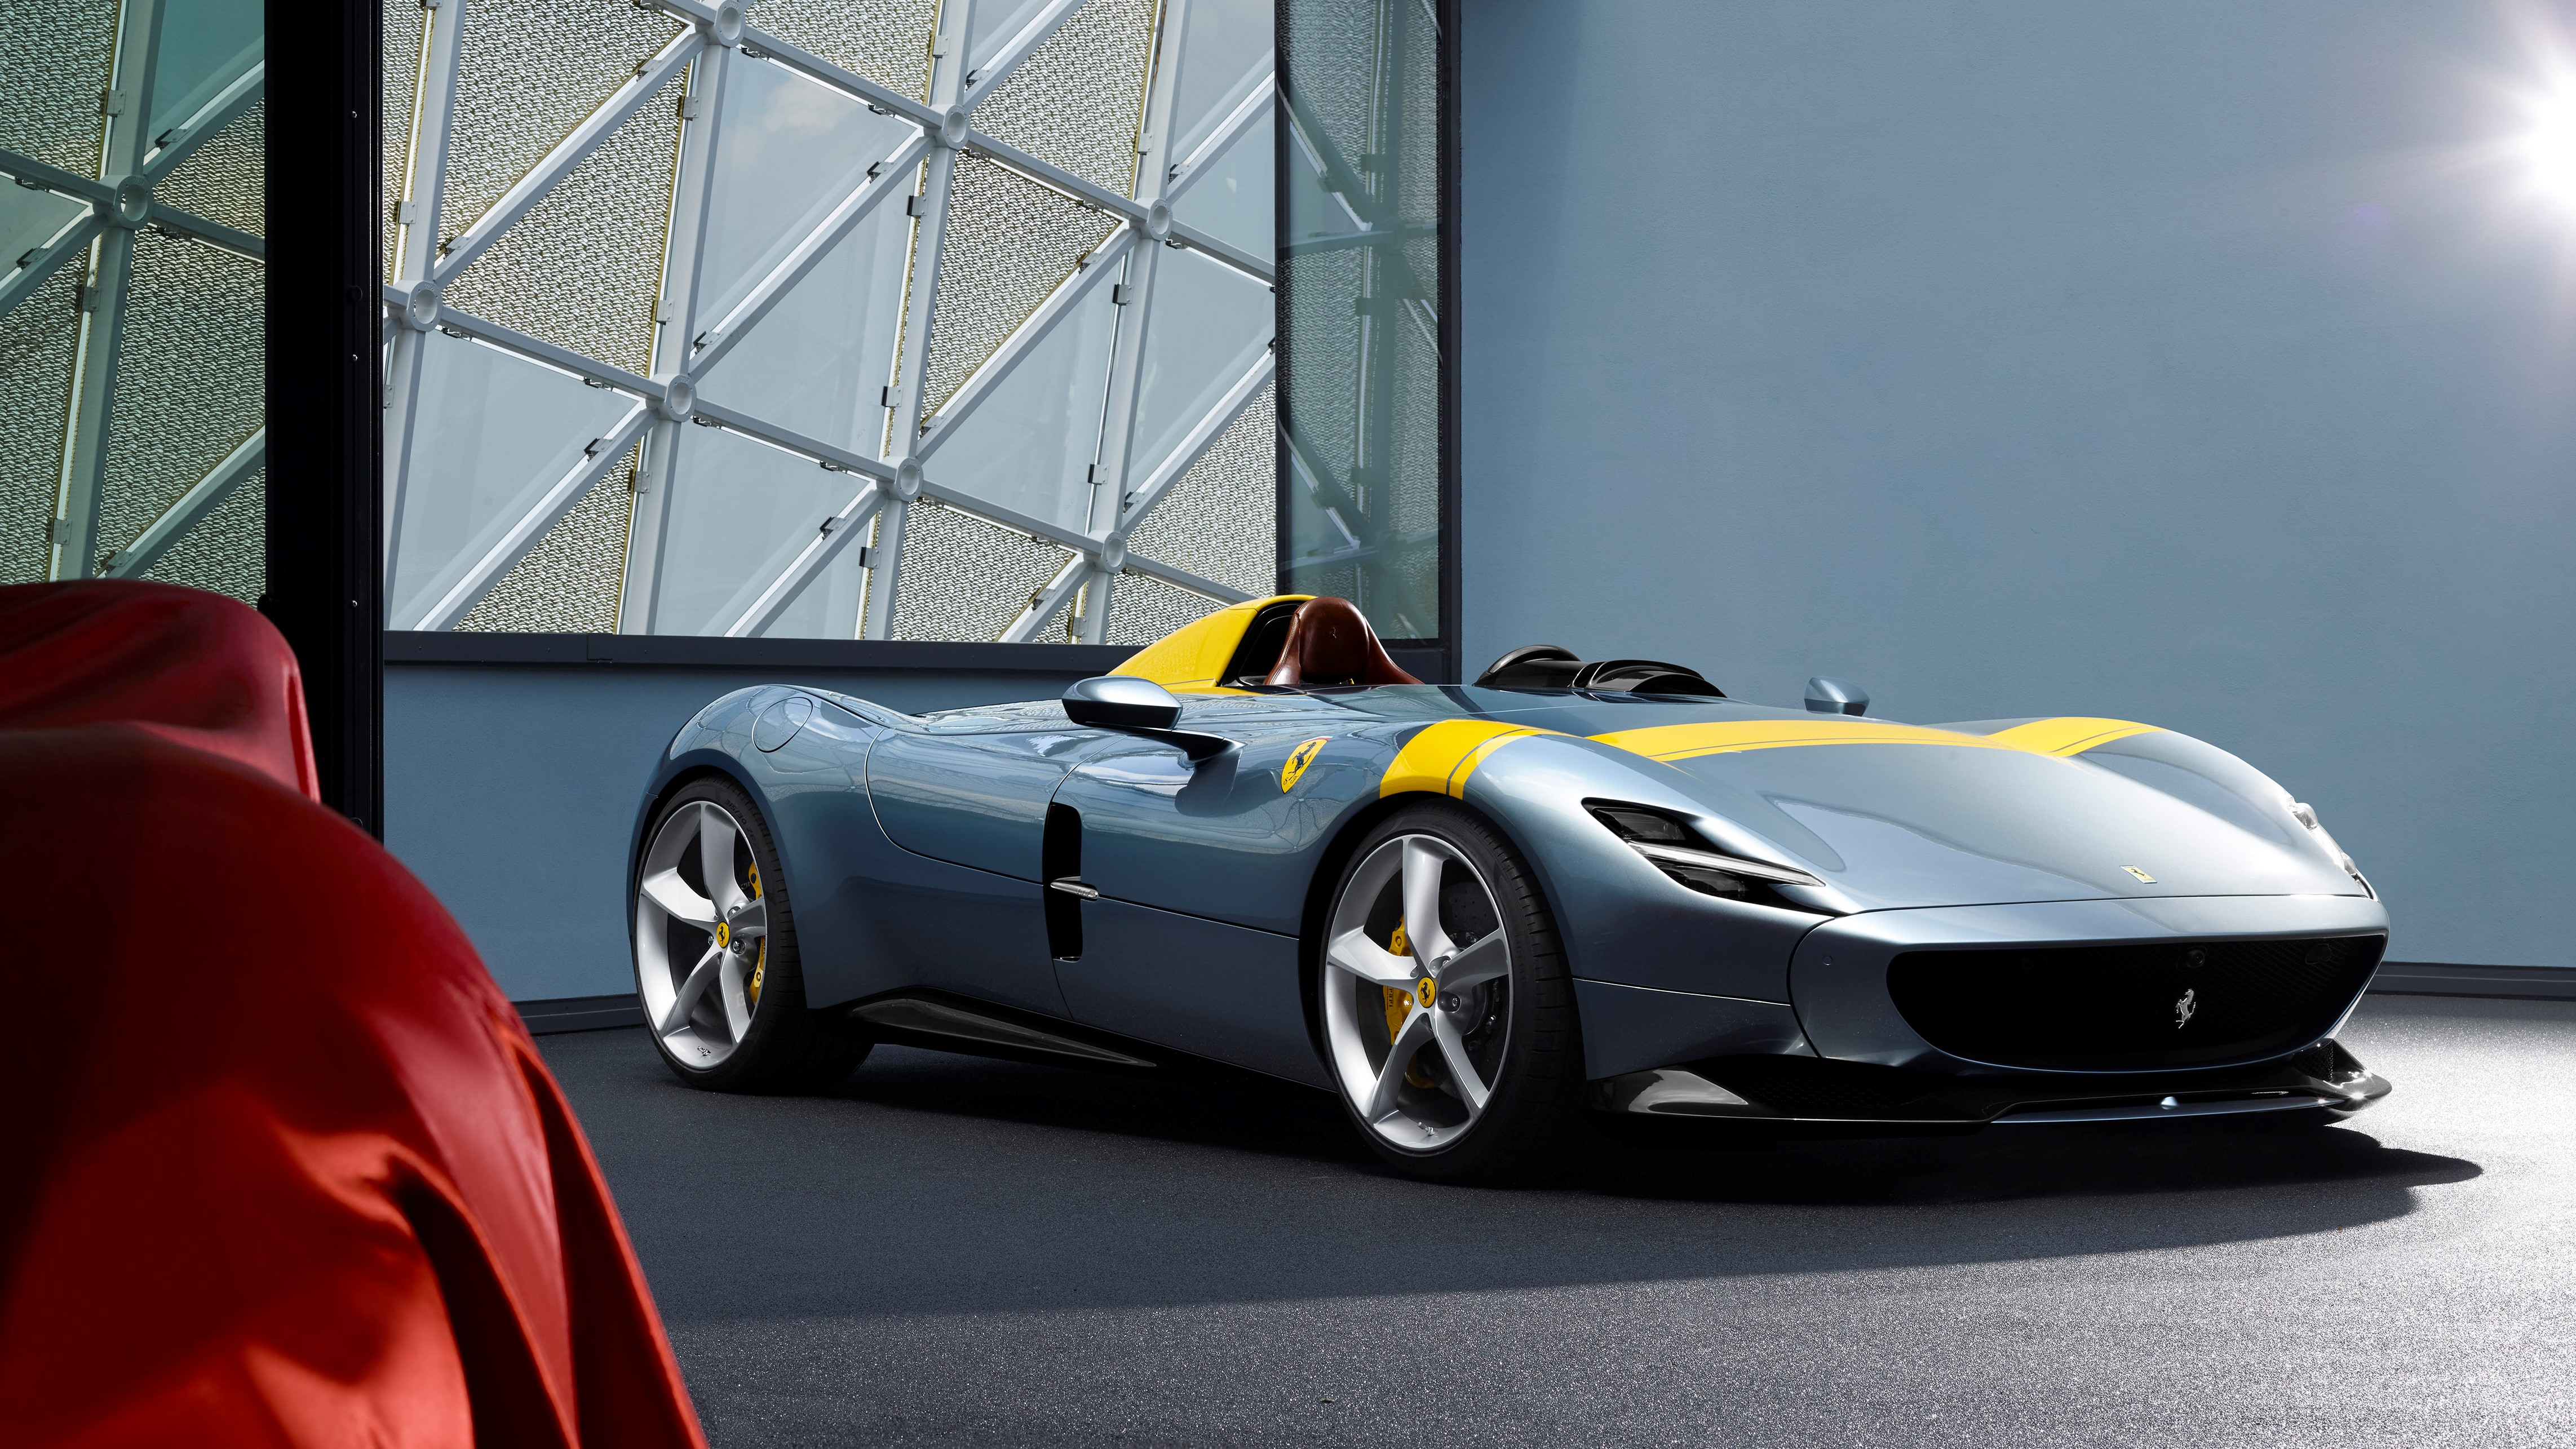 Ferrari reveals stunning Monza SP1 and SP2